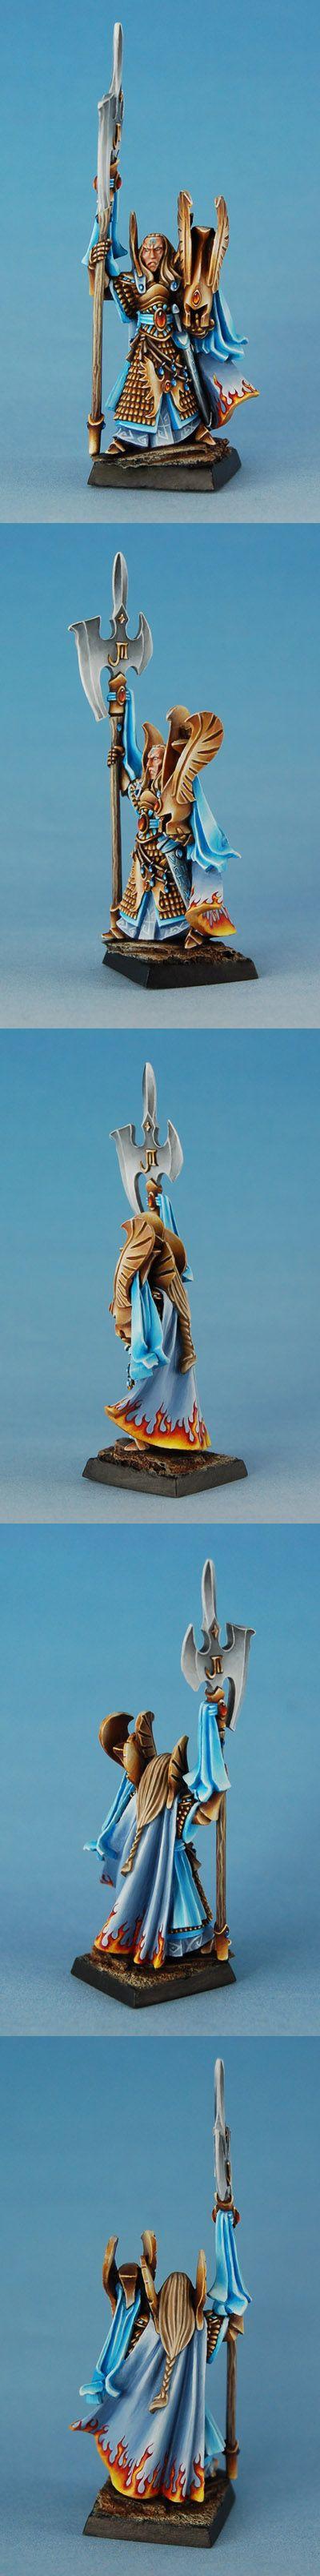 High Elf Caradryan - Phoenix Guard Captain